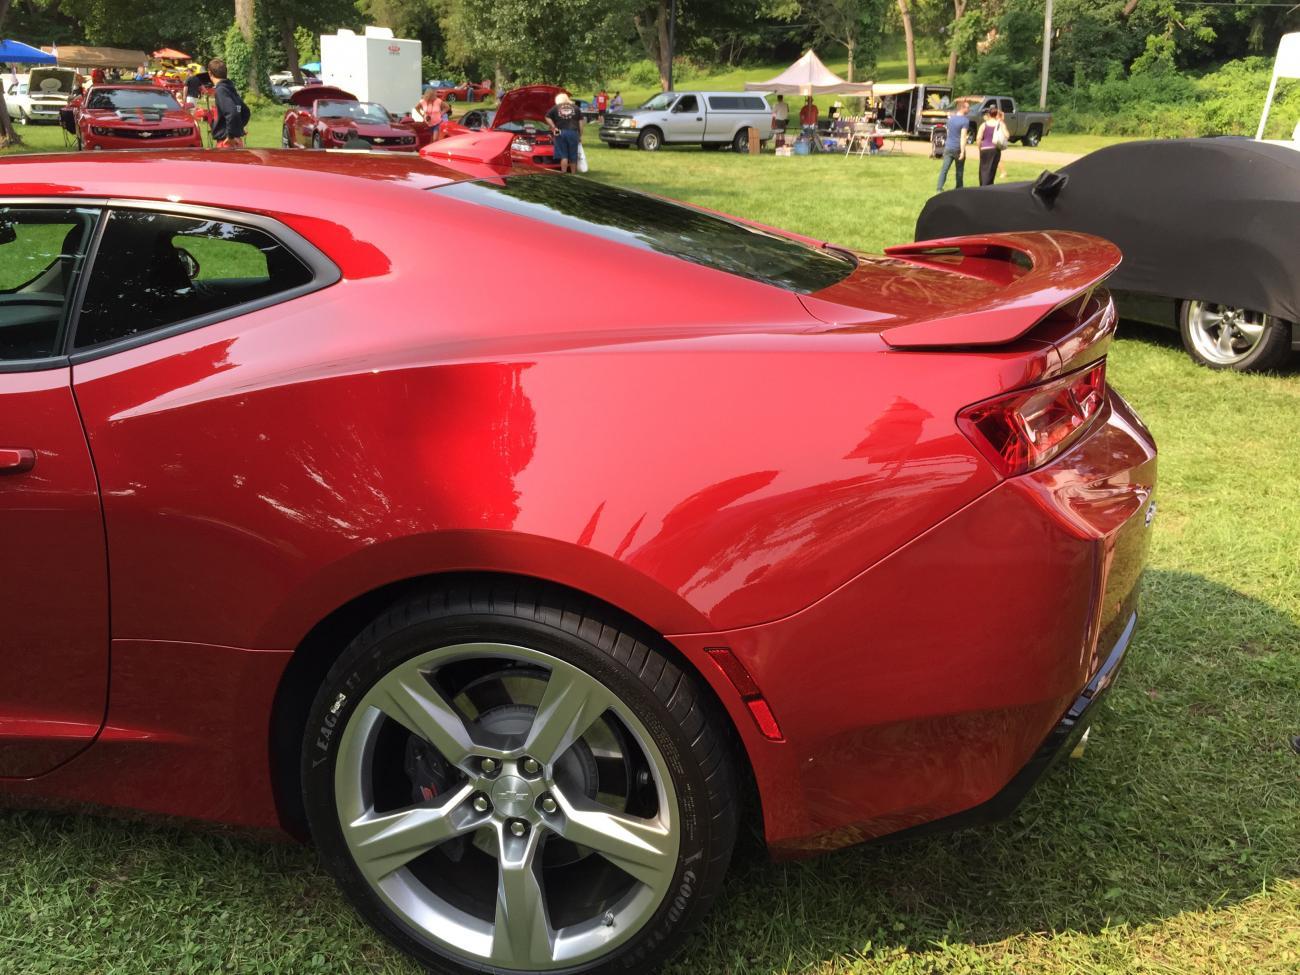 2016 Chevrolet Camaro Ss In Garnet Red Tintcoat